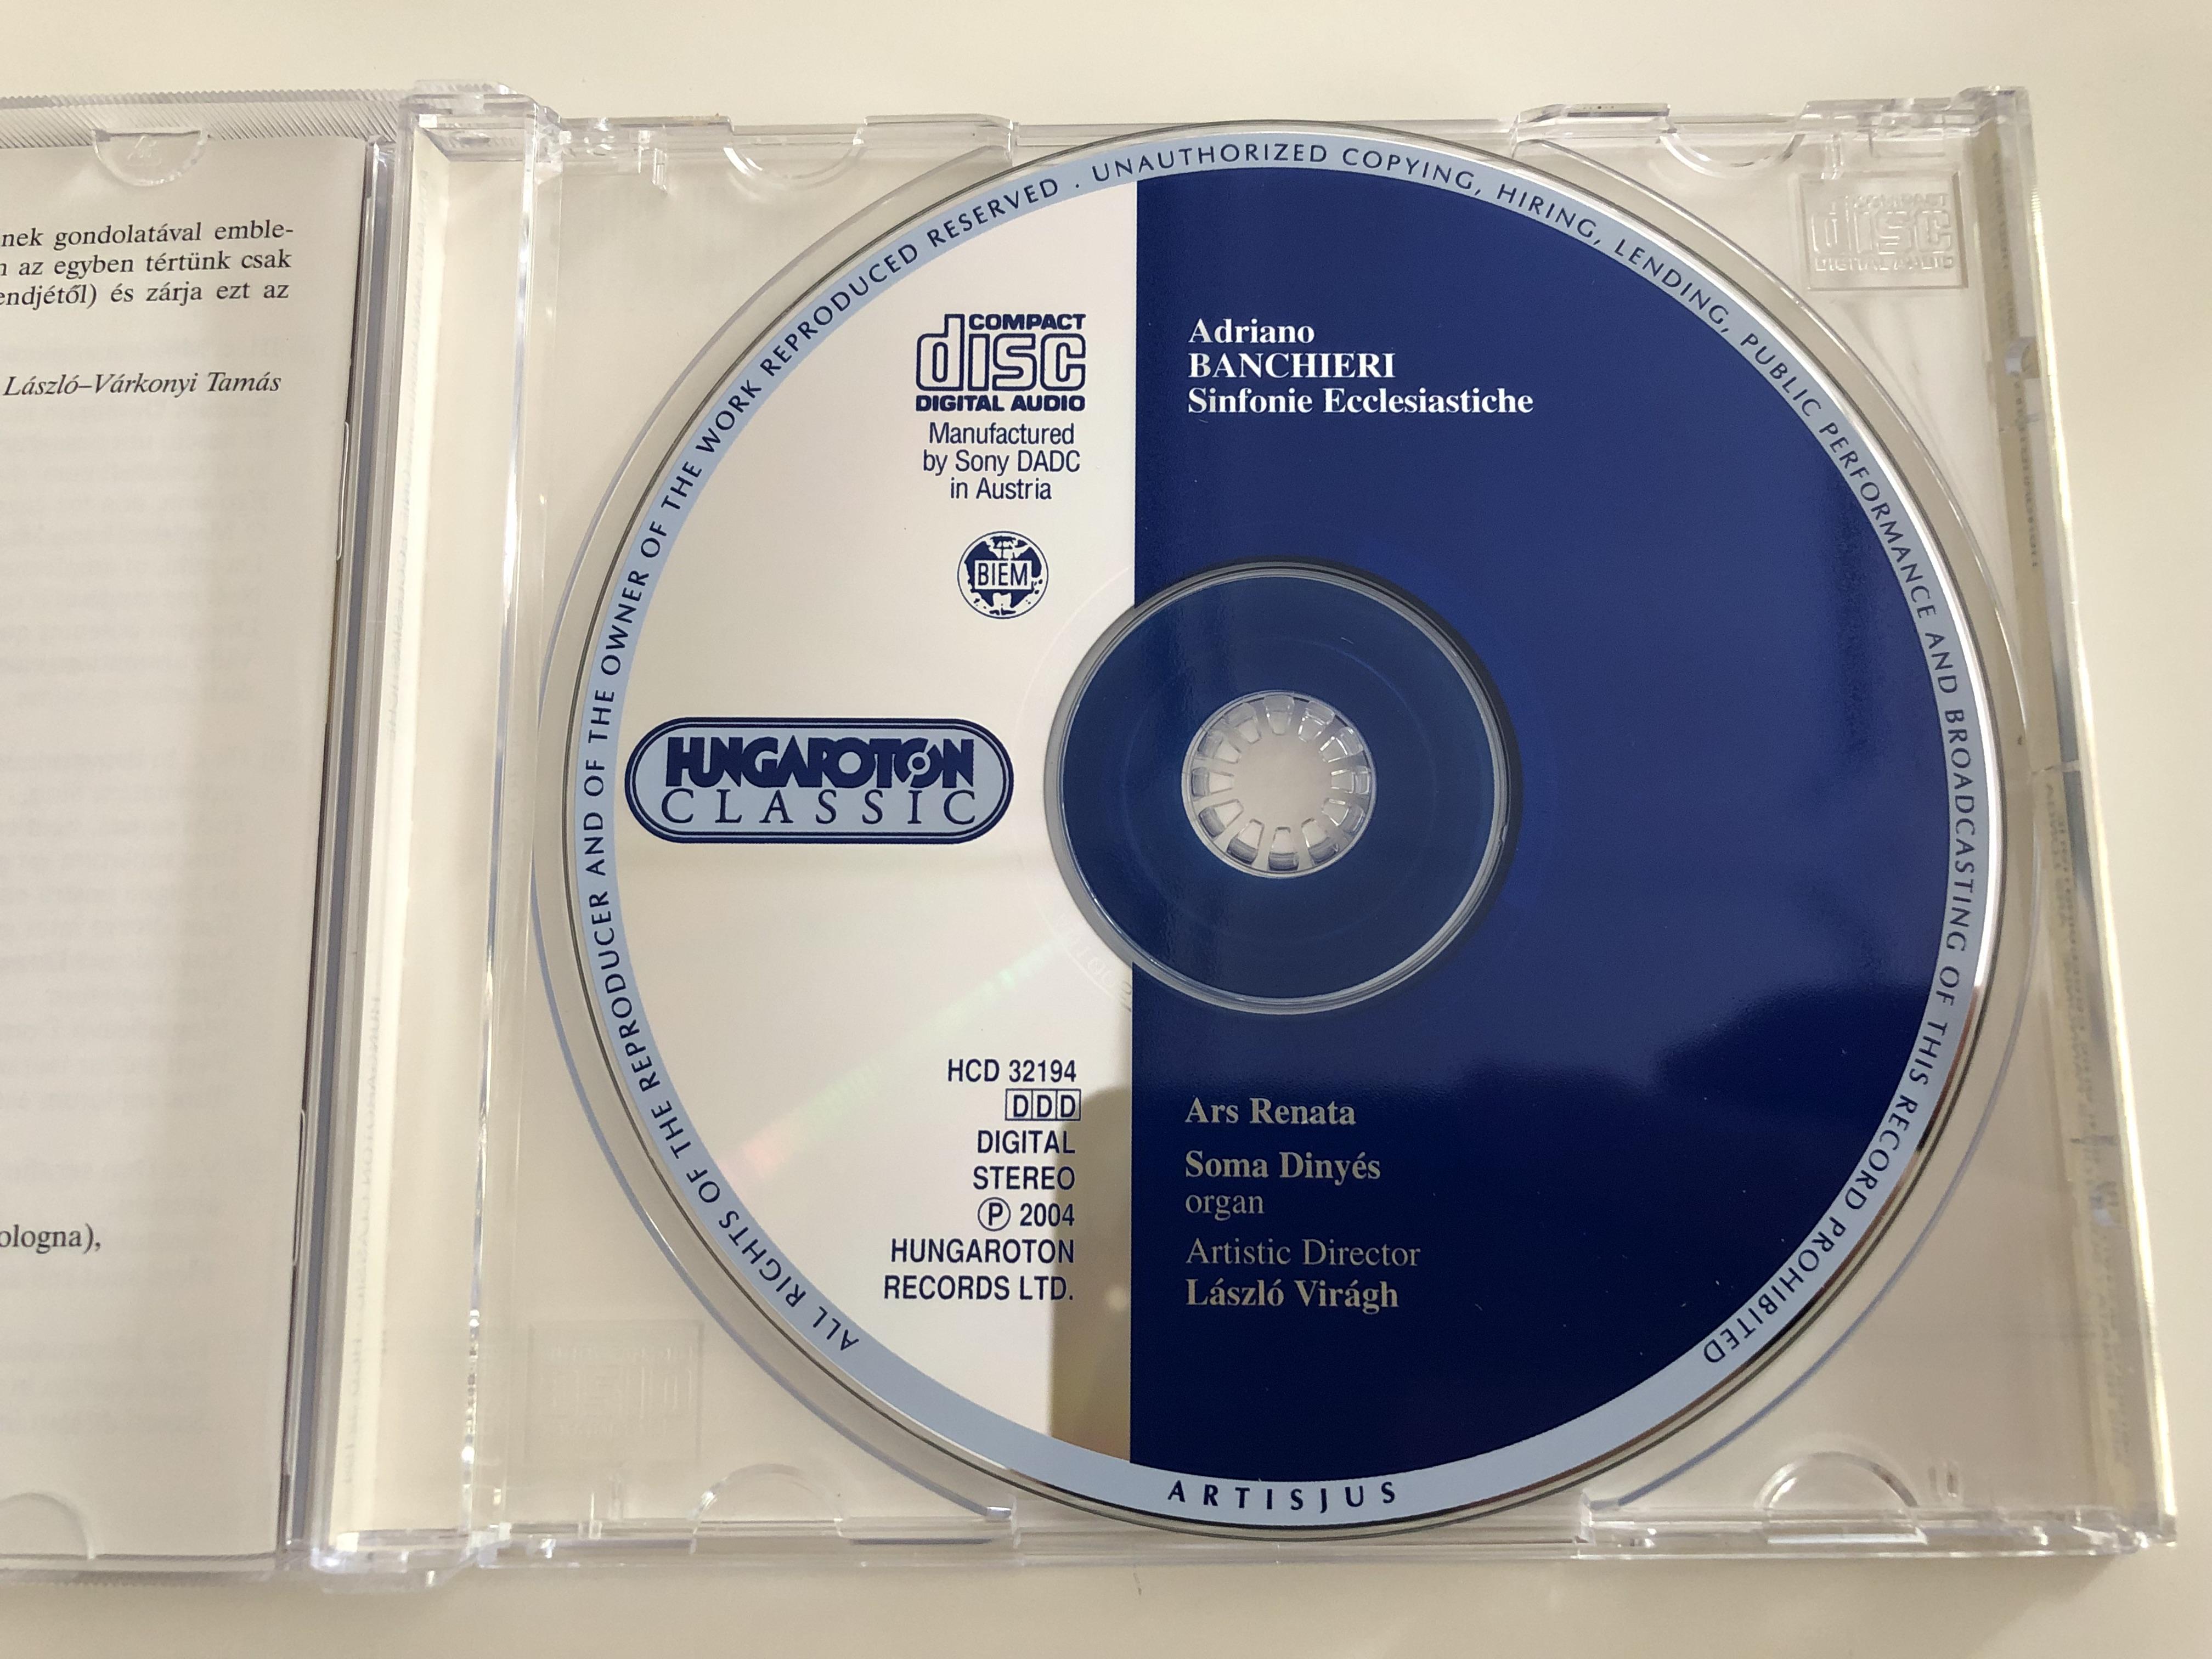 adriano-banchieri-sinfonie-ecclesiastiche-ars-renata-soma-diny-s-organ-l-szl-vir-gh-artistic-director-hungaroton-classic-audio-cd-2004-hcd-32194-9-.jpg